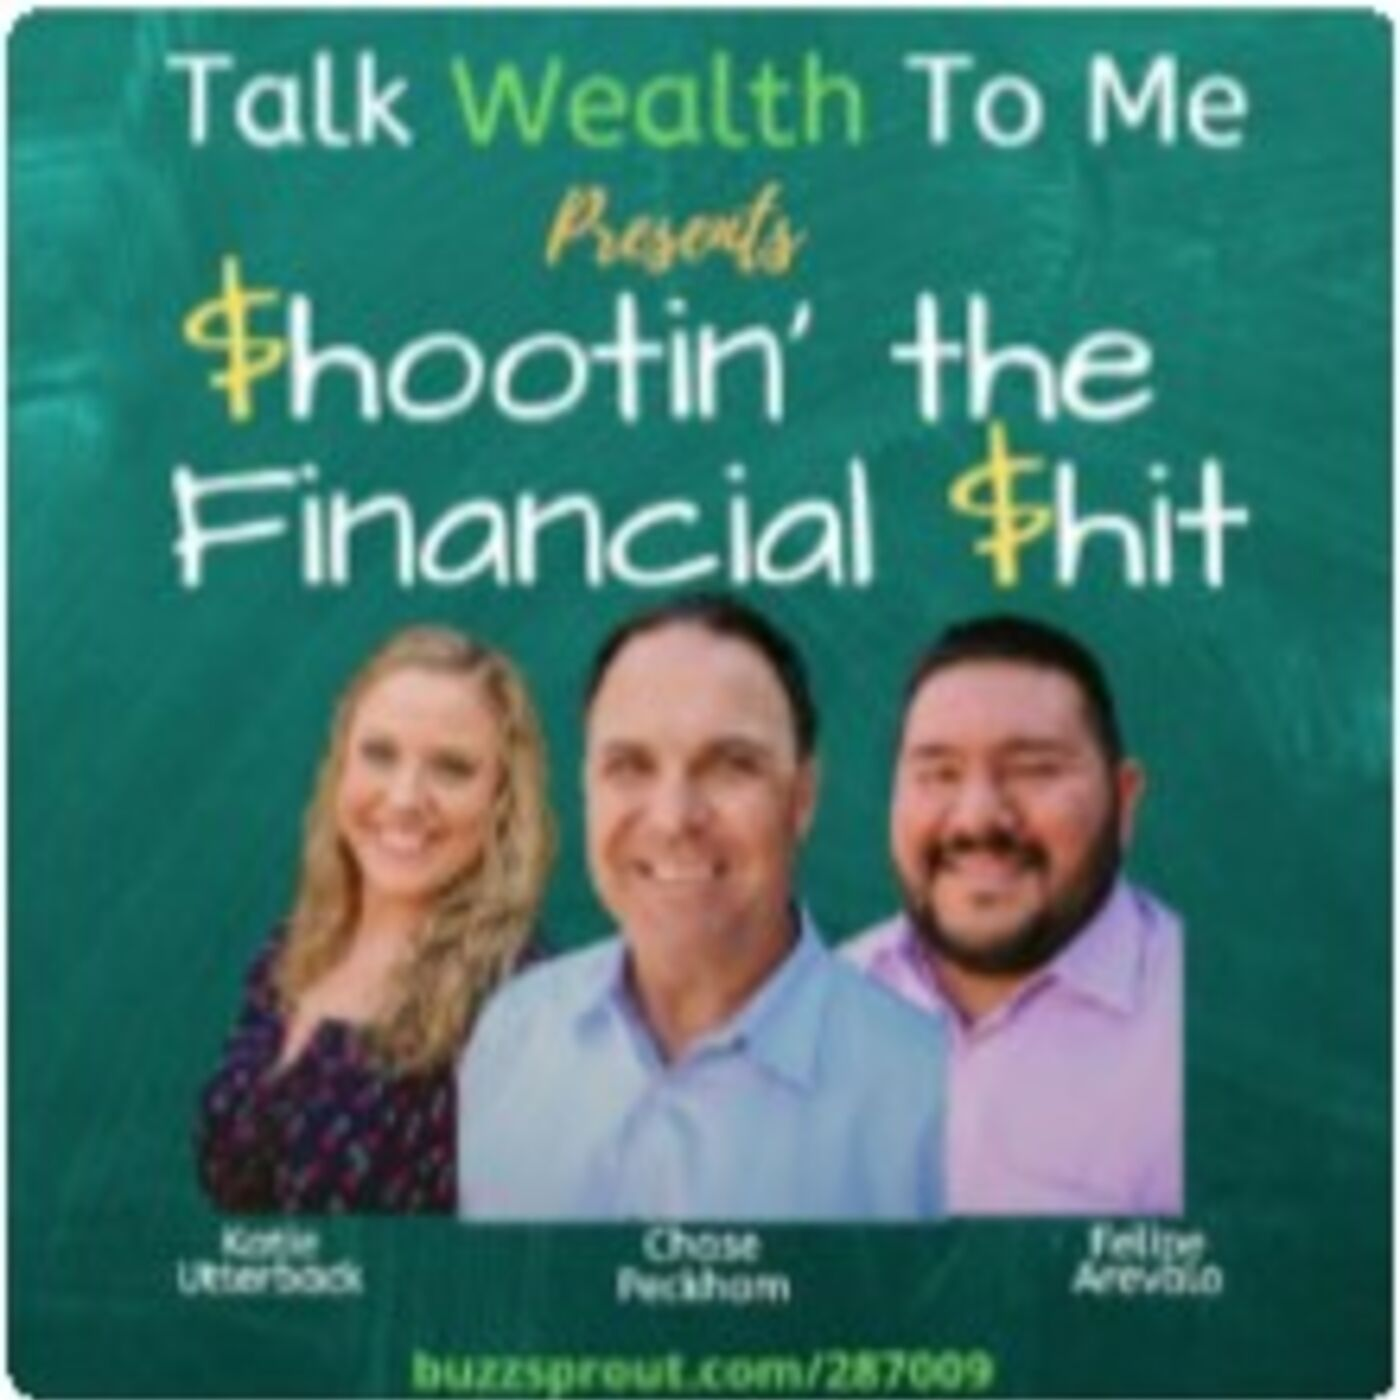 #102 Finances and Mental Health